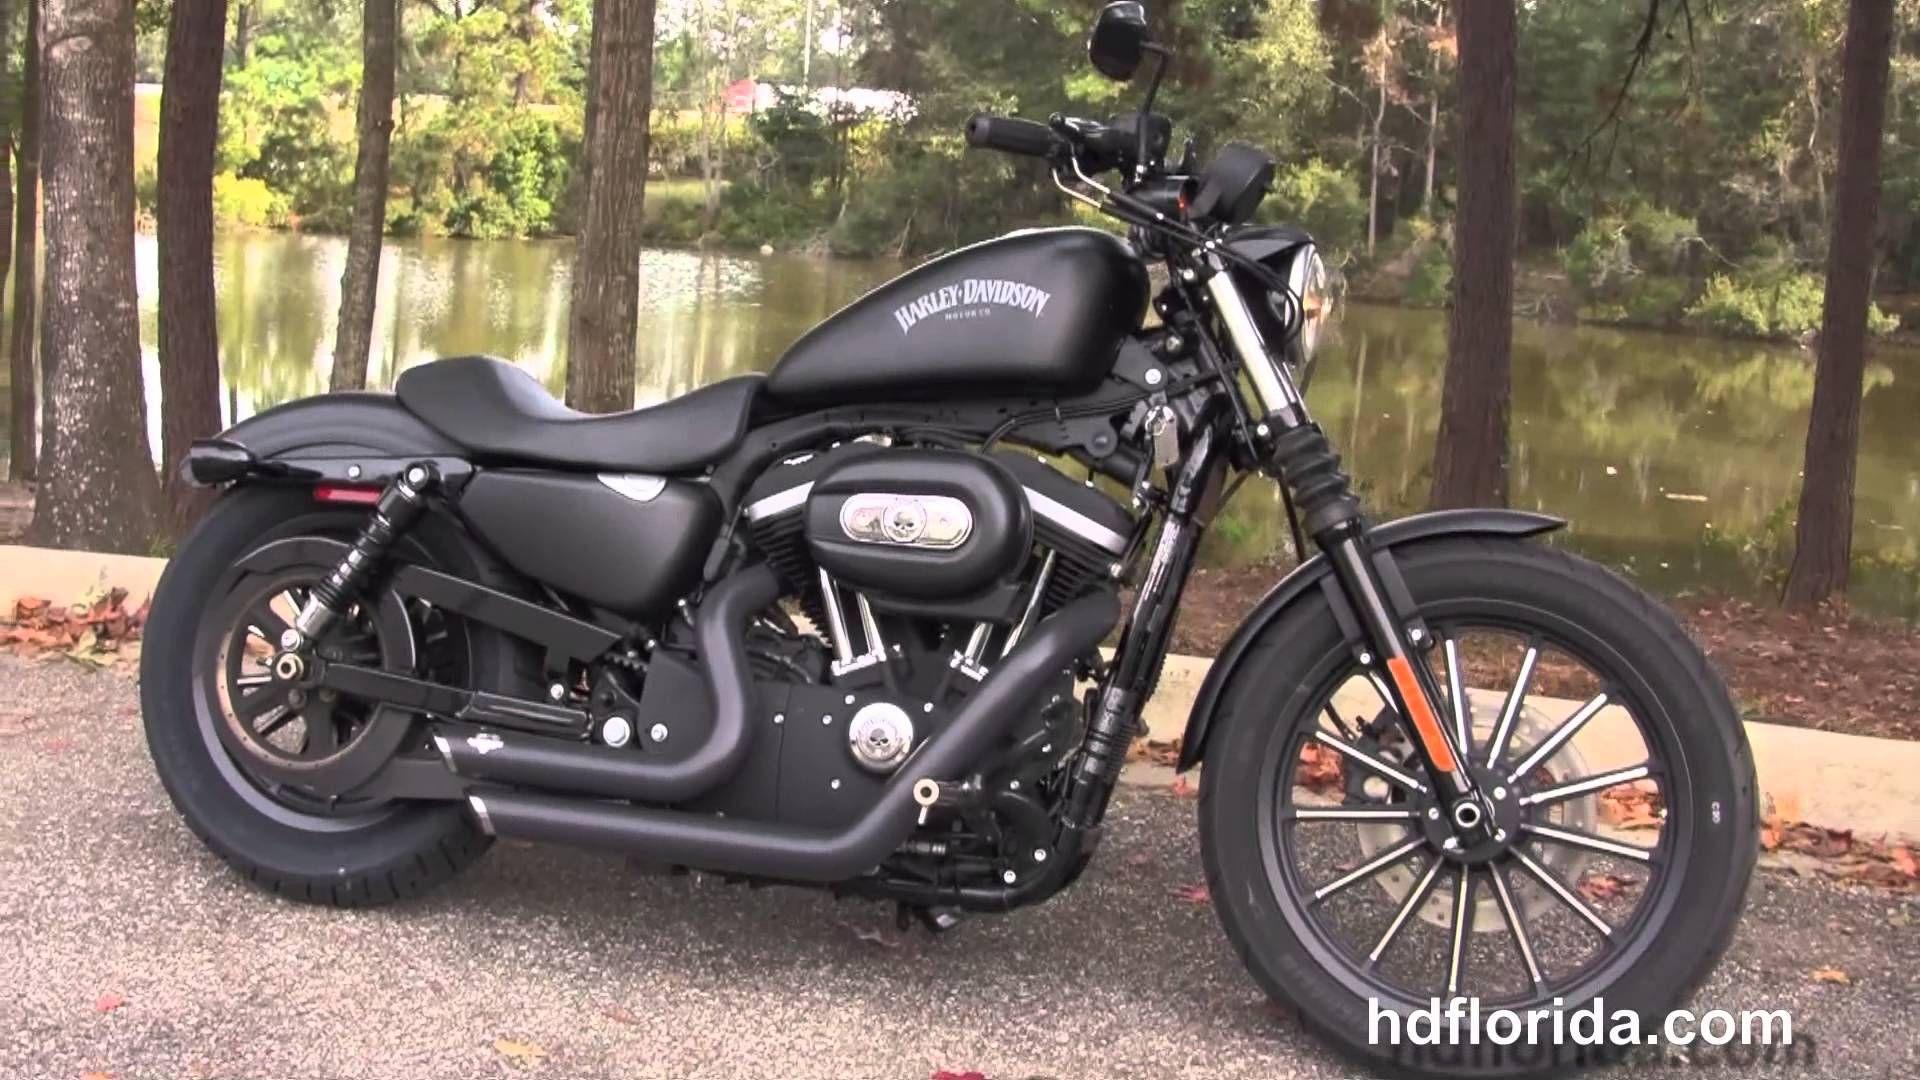 Harley Davidson Iron 883.   Cars and motorcycles   Pinterest ...